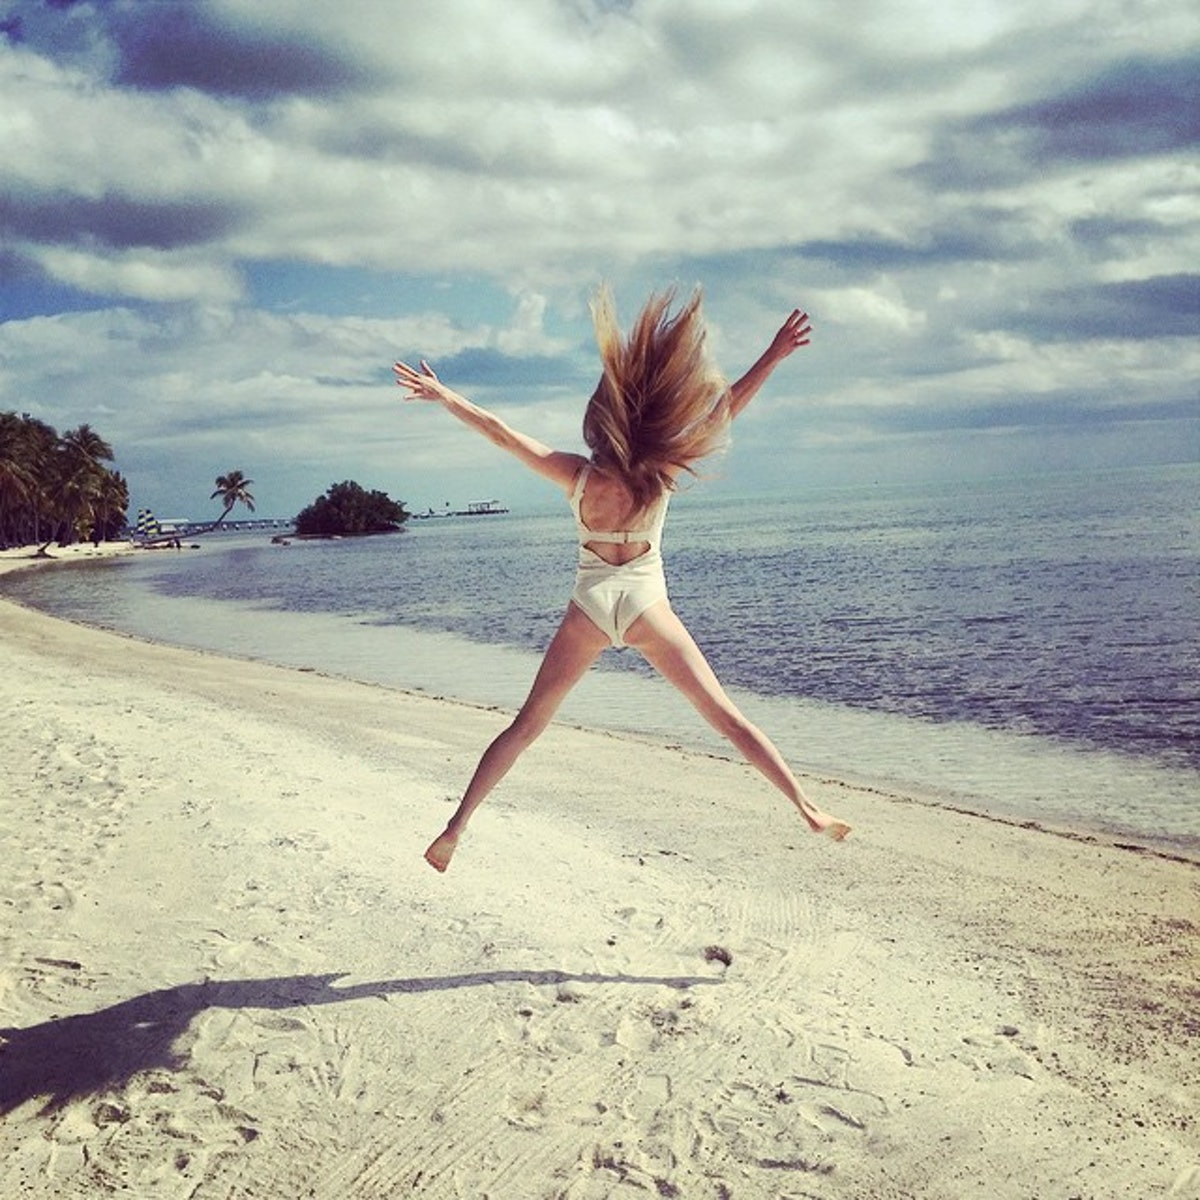 amanda-seyfried-instagram-4.jpg